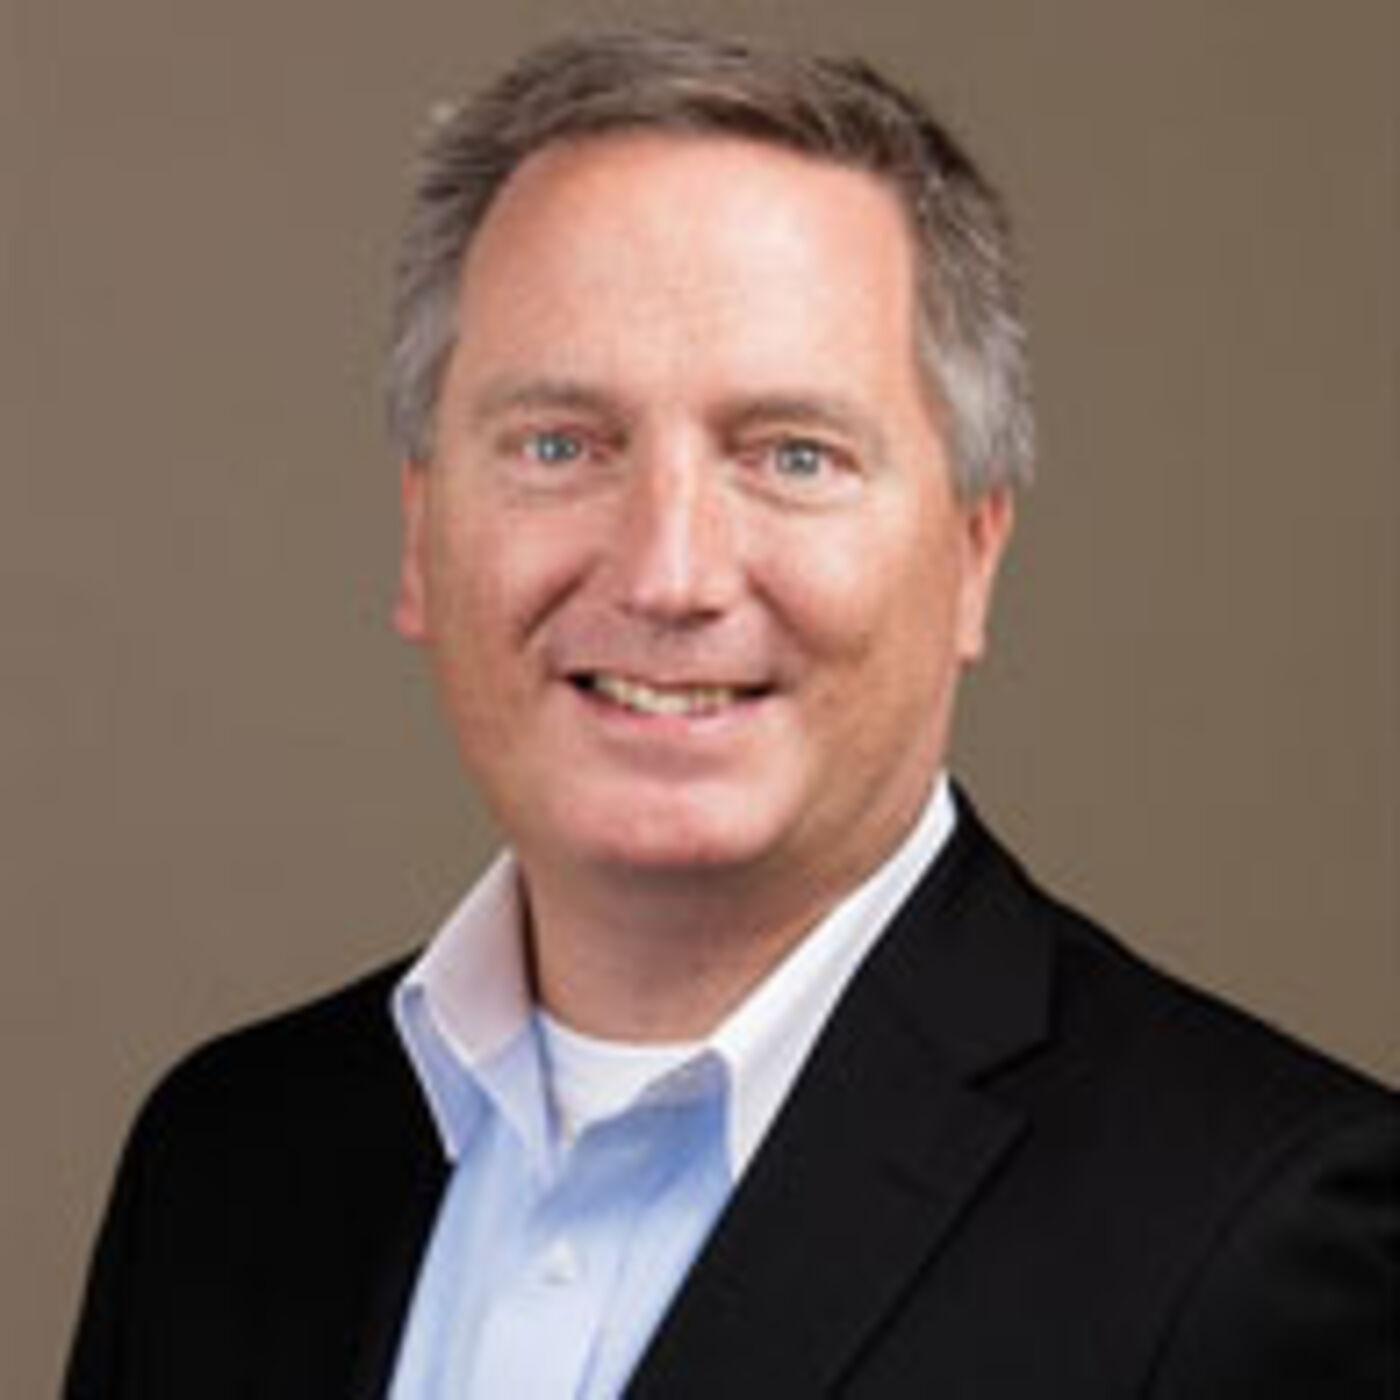 Lightning talk: Johan Westin CTO i Huawei Nordic